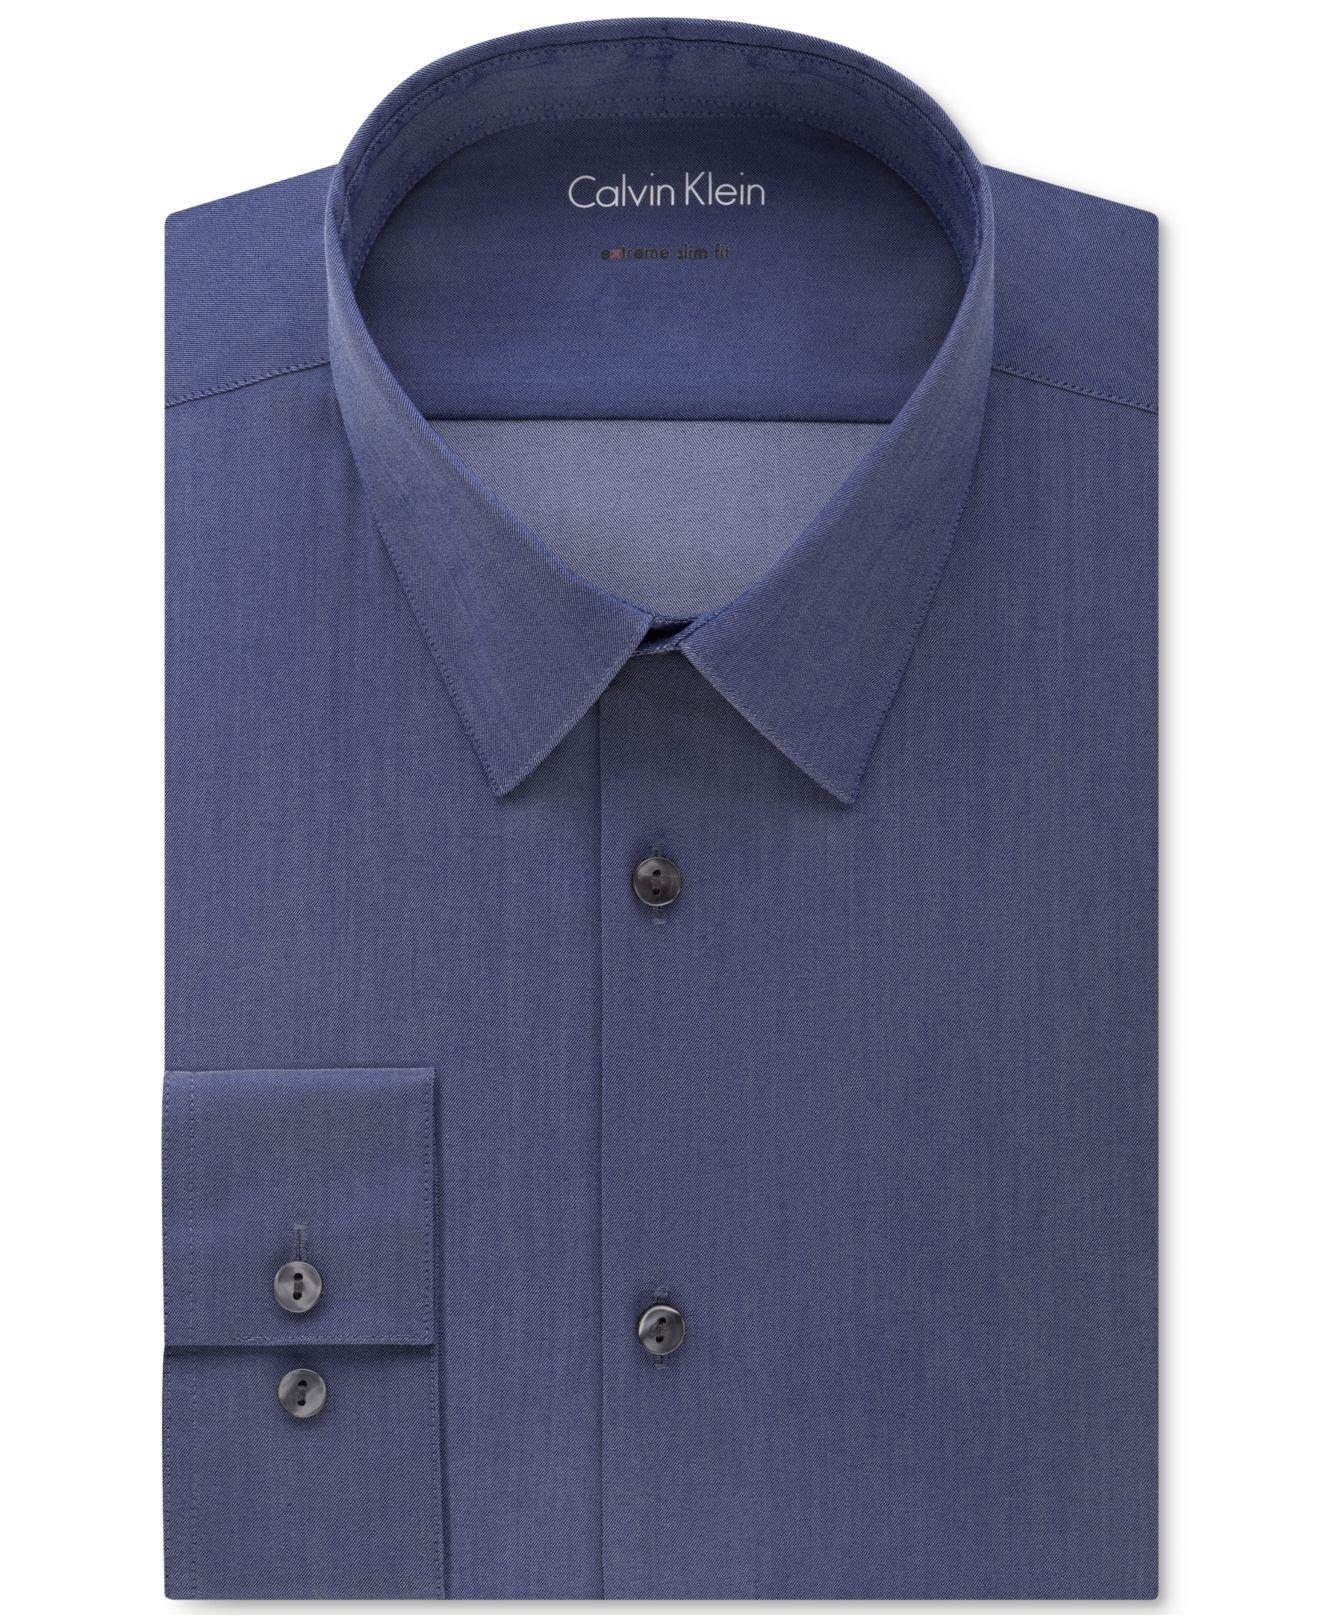 Calvin klein men 39 s extra slim fit stretch navy chambray for Extra slim dress shirt